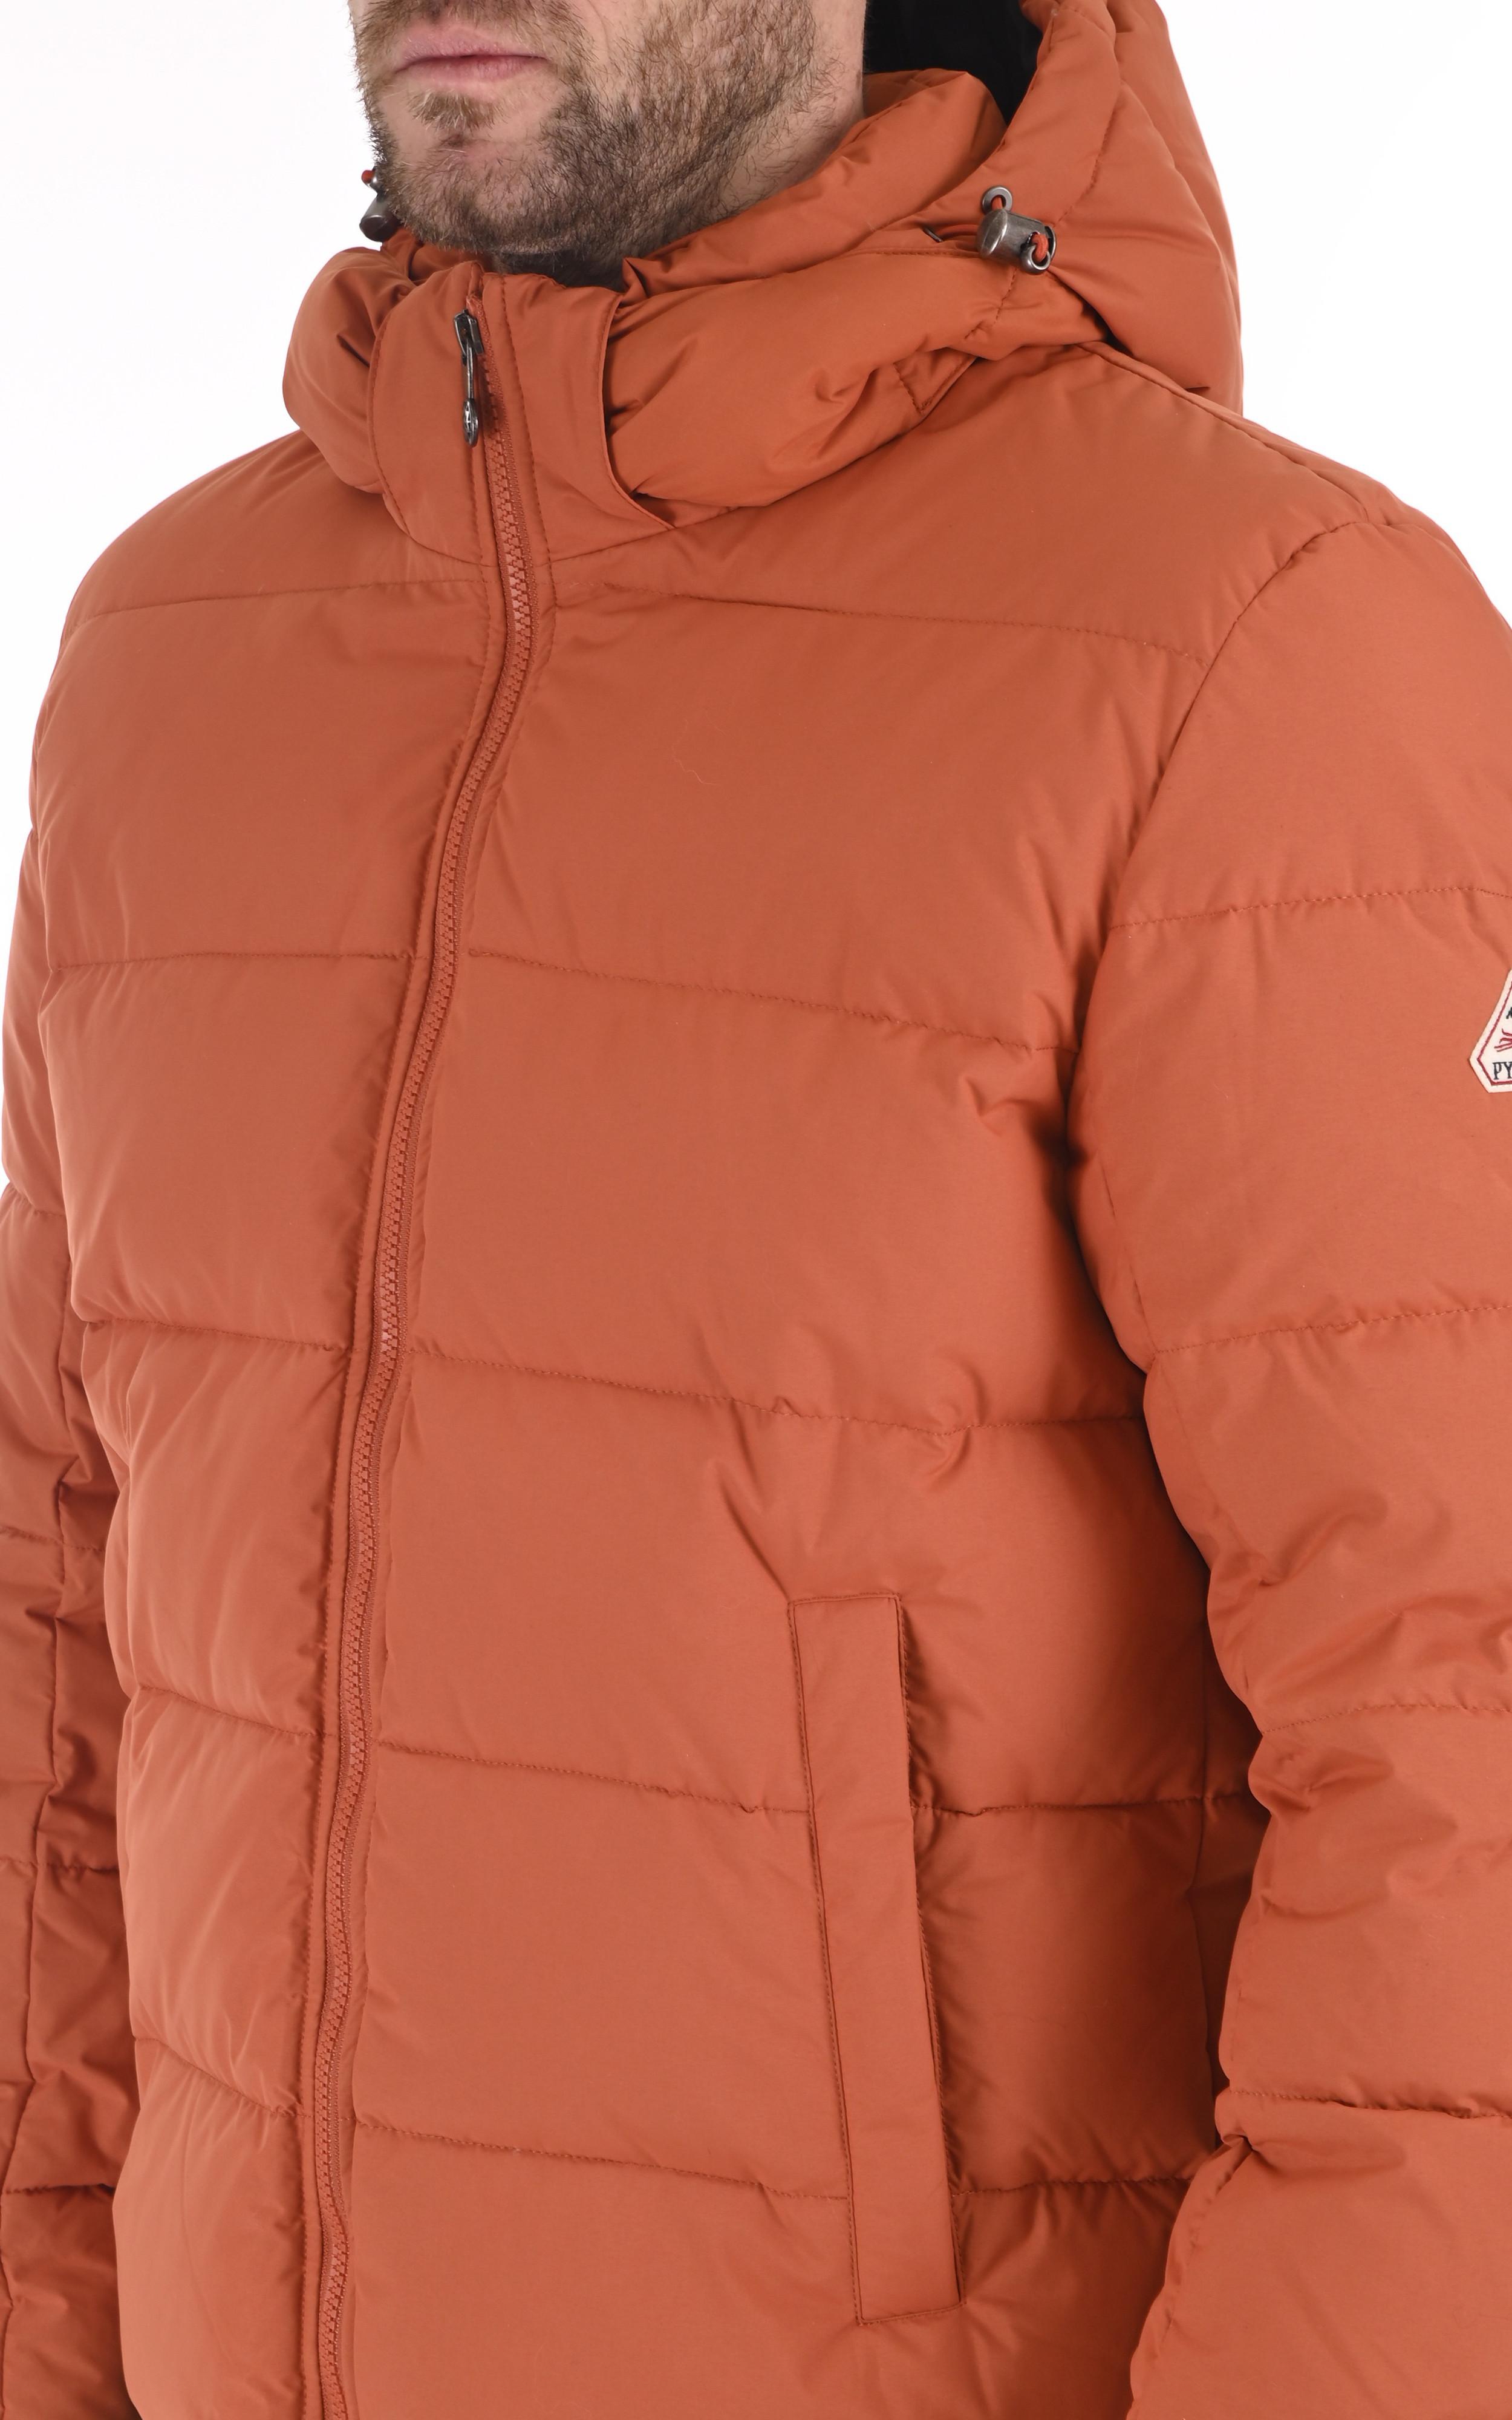 Doudoune Spoutnic orange rust Pyrenex